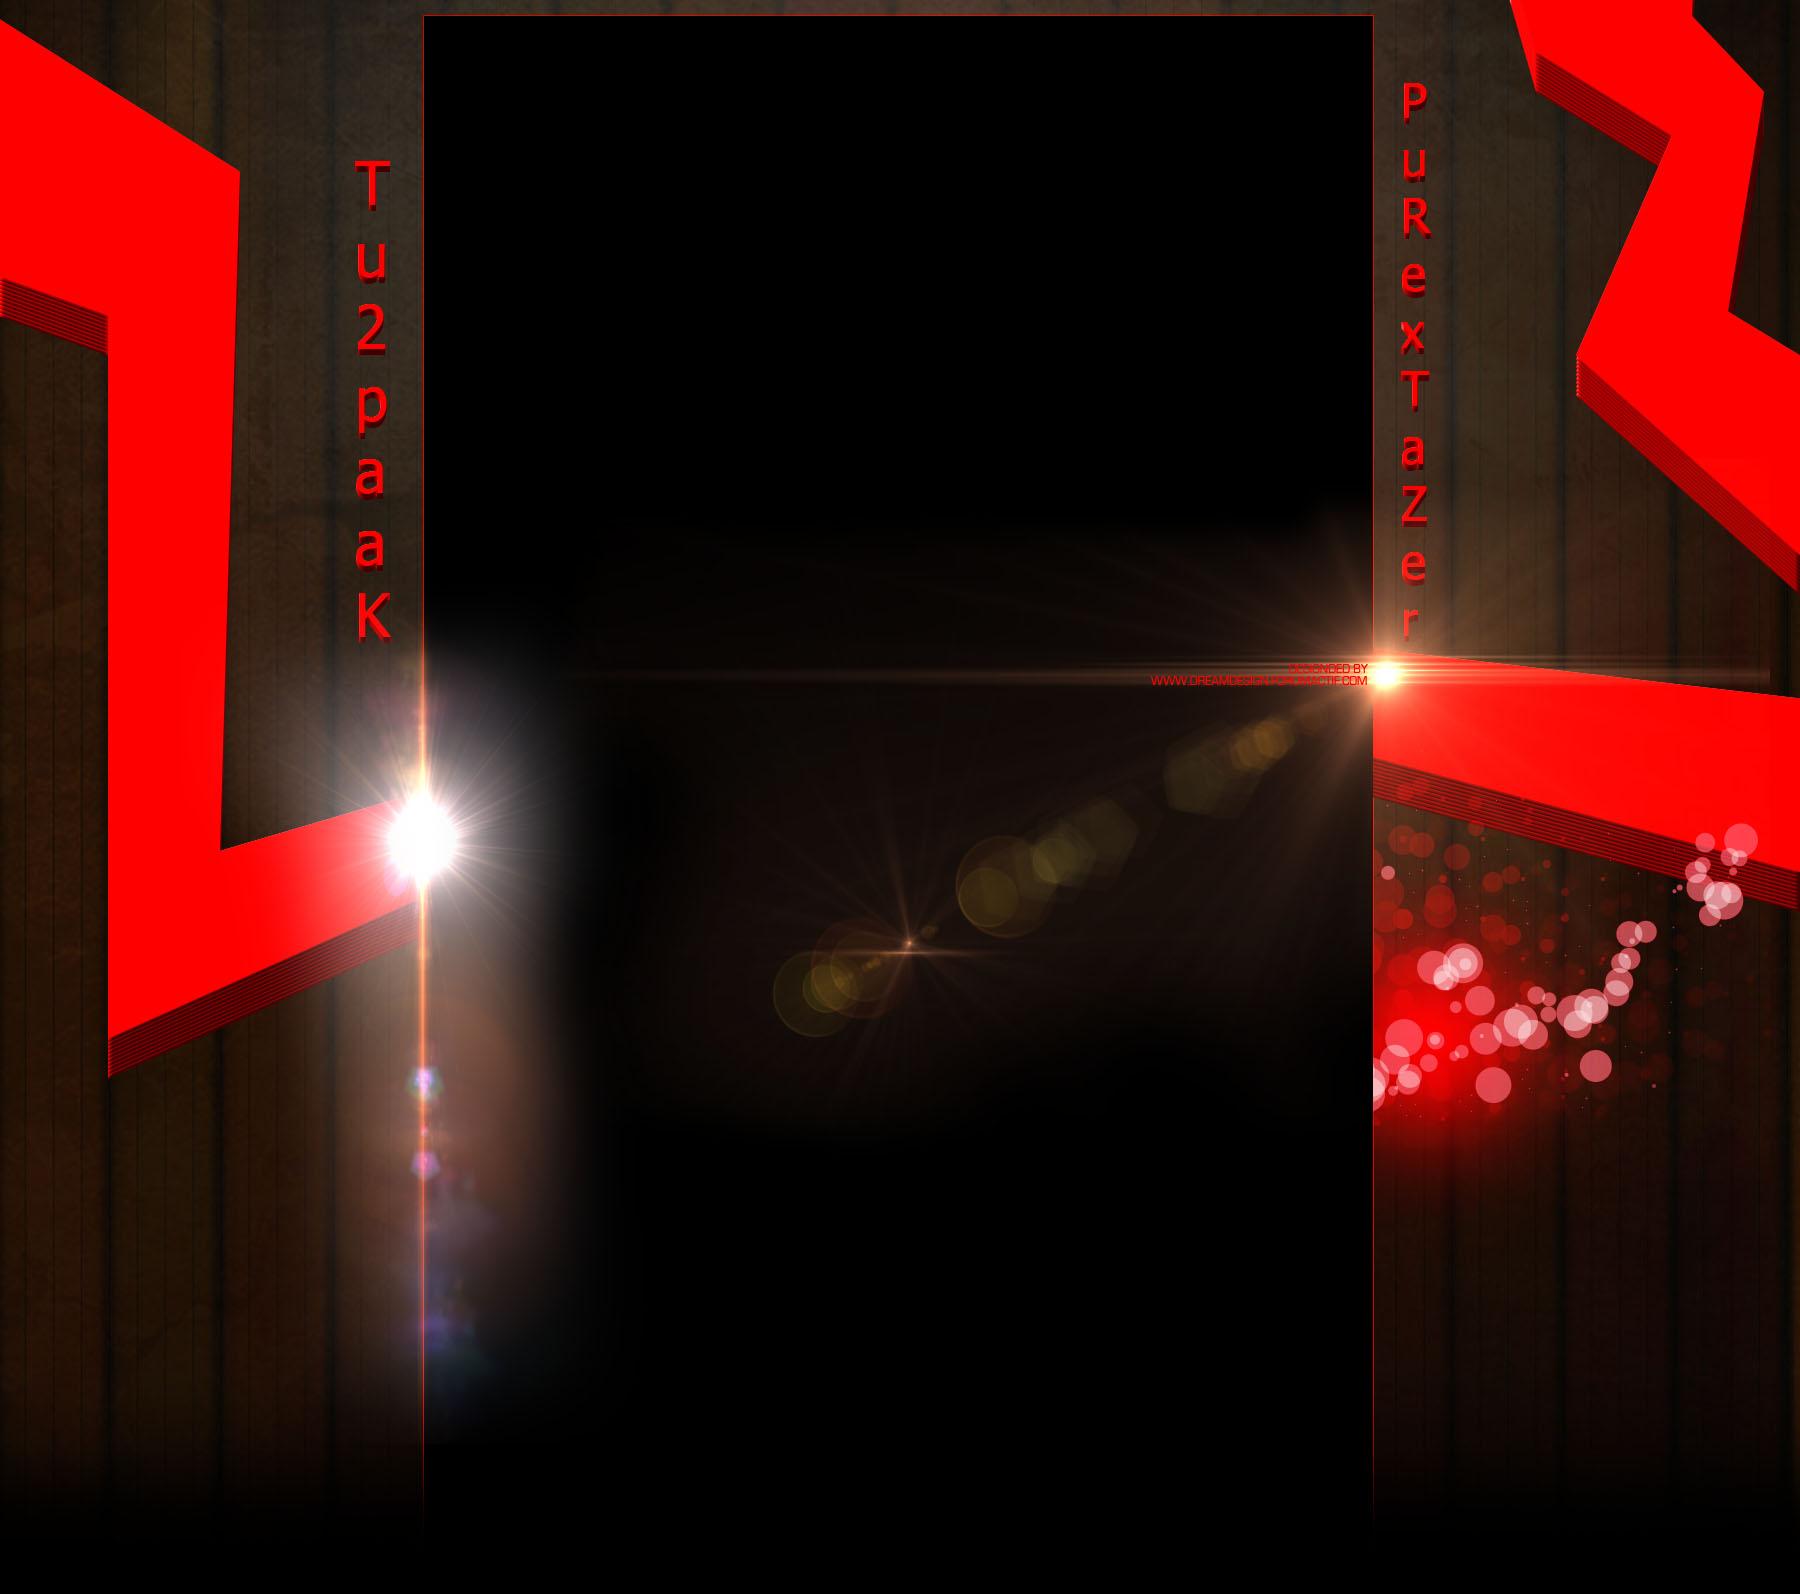 Commande background youtube de Tu2paaK 1324230528024523300